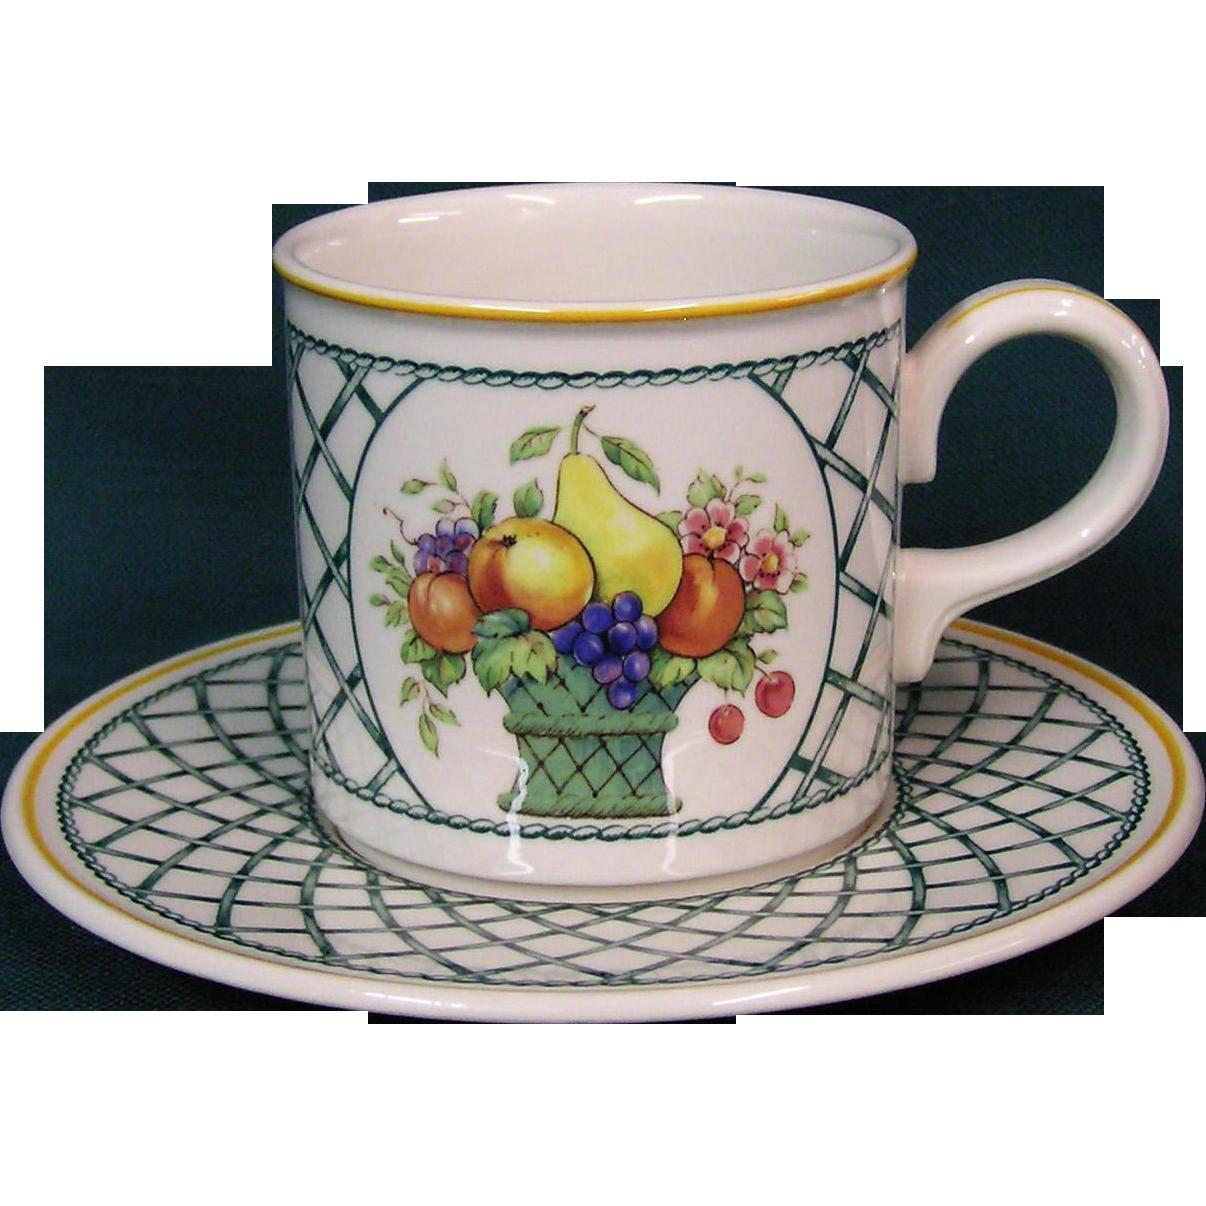 Villeroy boch basket pattern cup saucer from for Villeroy boch outlet